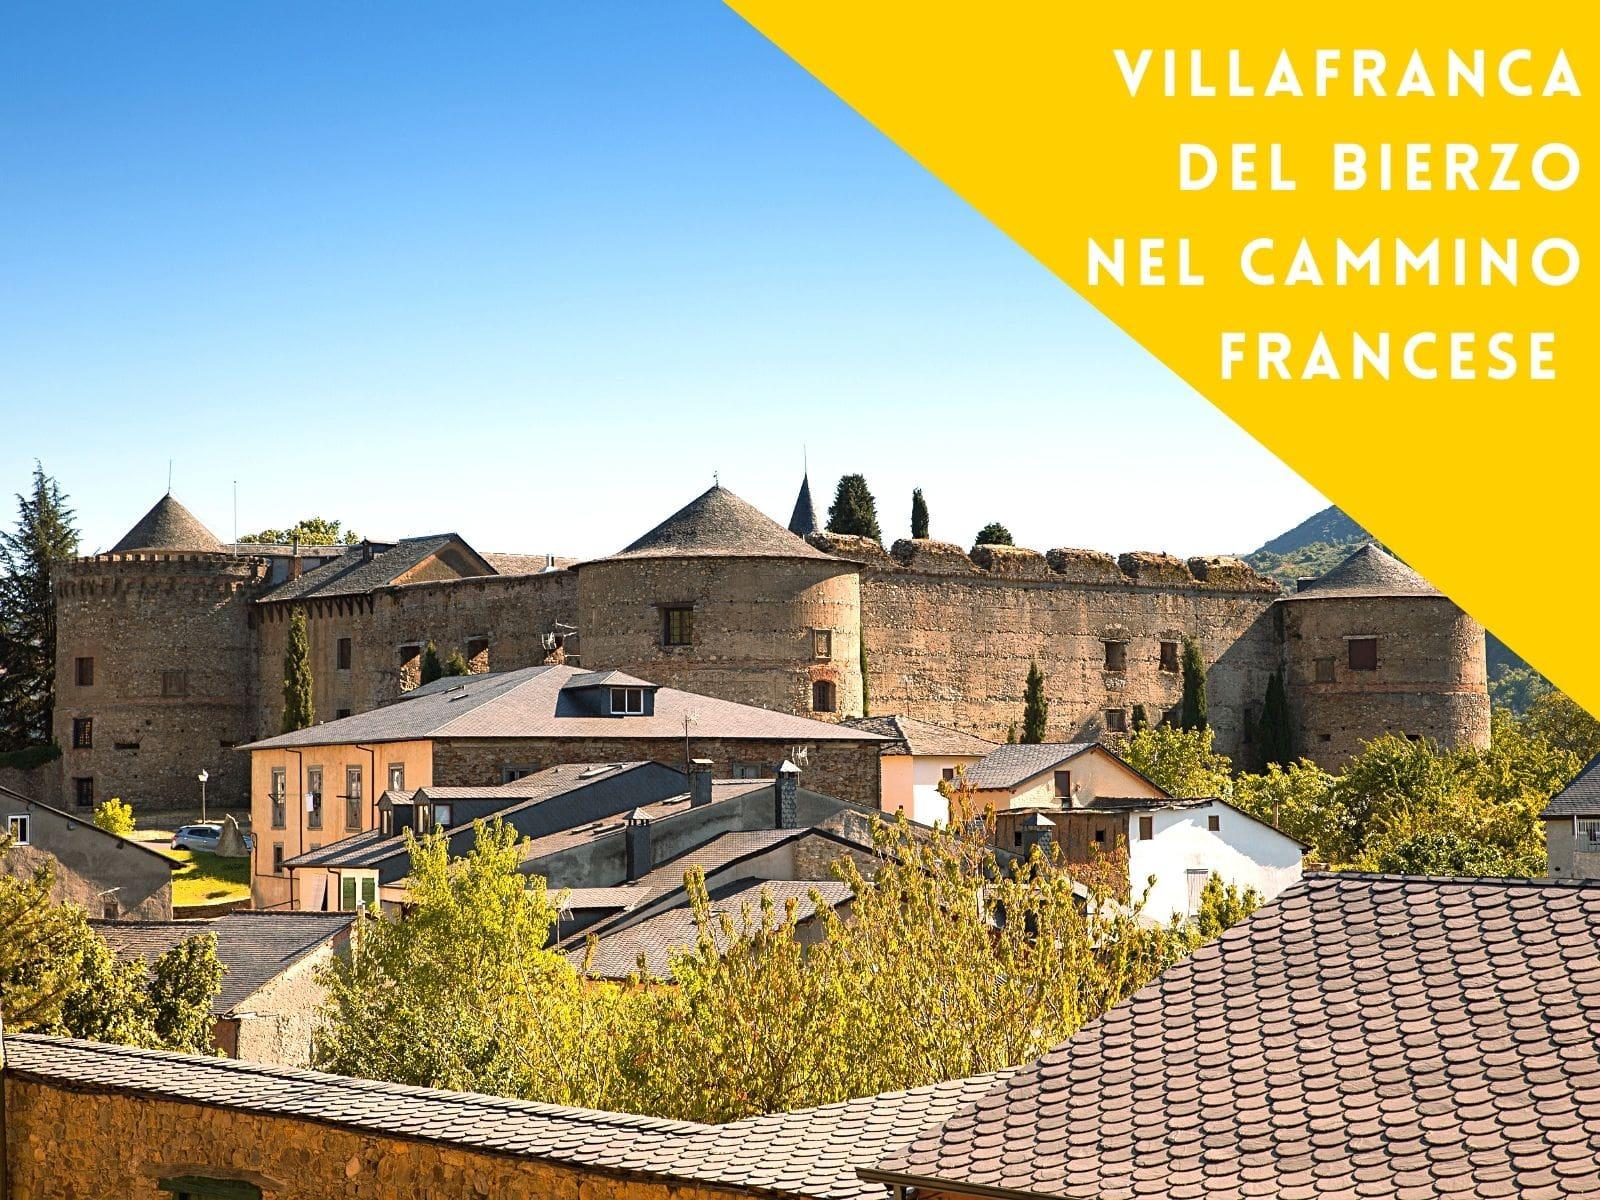 Villafranca del Bierzo nel Cammino Francese